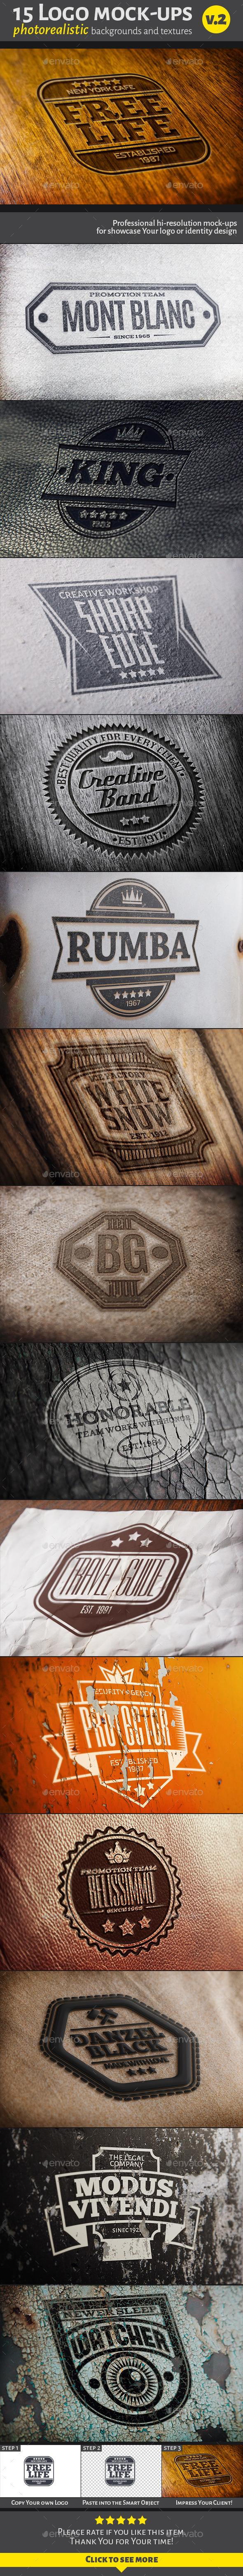 15 Logo Mock-ups v.2 - Logo Product Mock-Ups